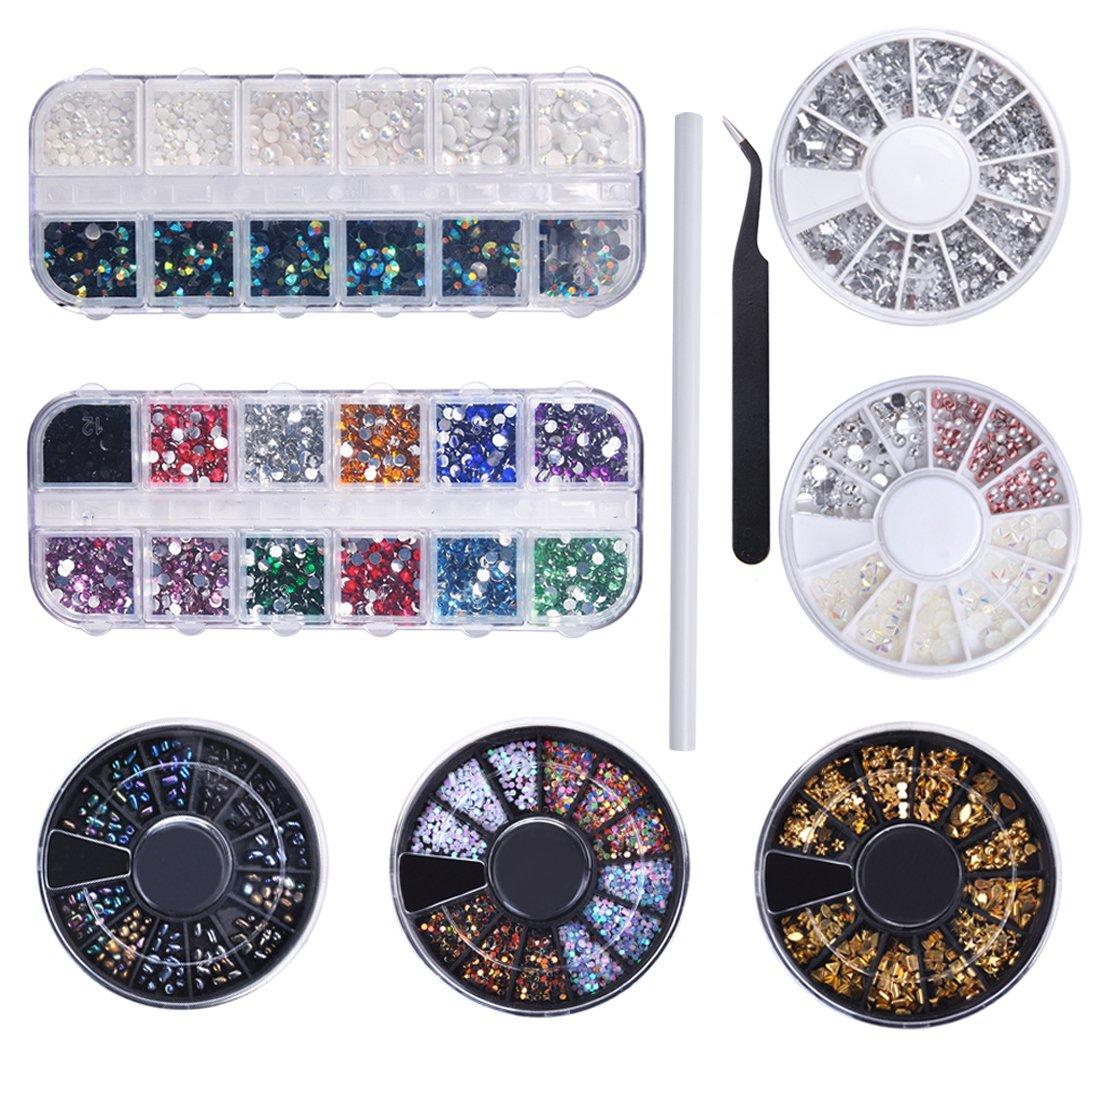 Biutee 10 Wheels nail art decor accessories Nail Rhinestones Premium Manicure Nail Art Decorations Nail Tools TOOL-AT-730